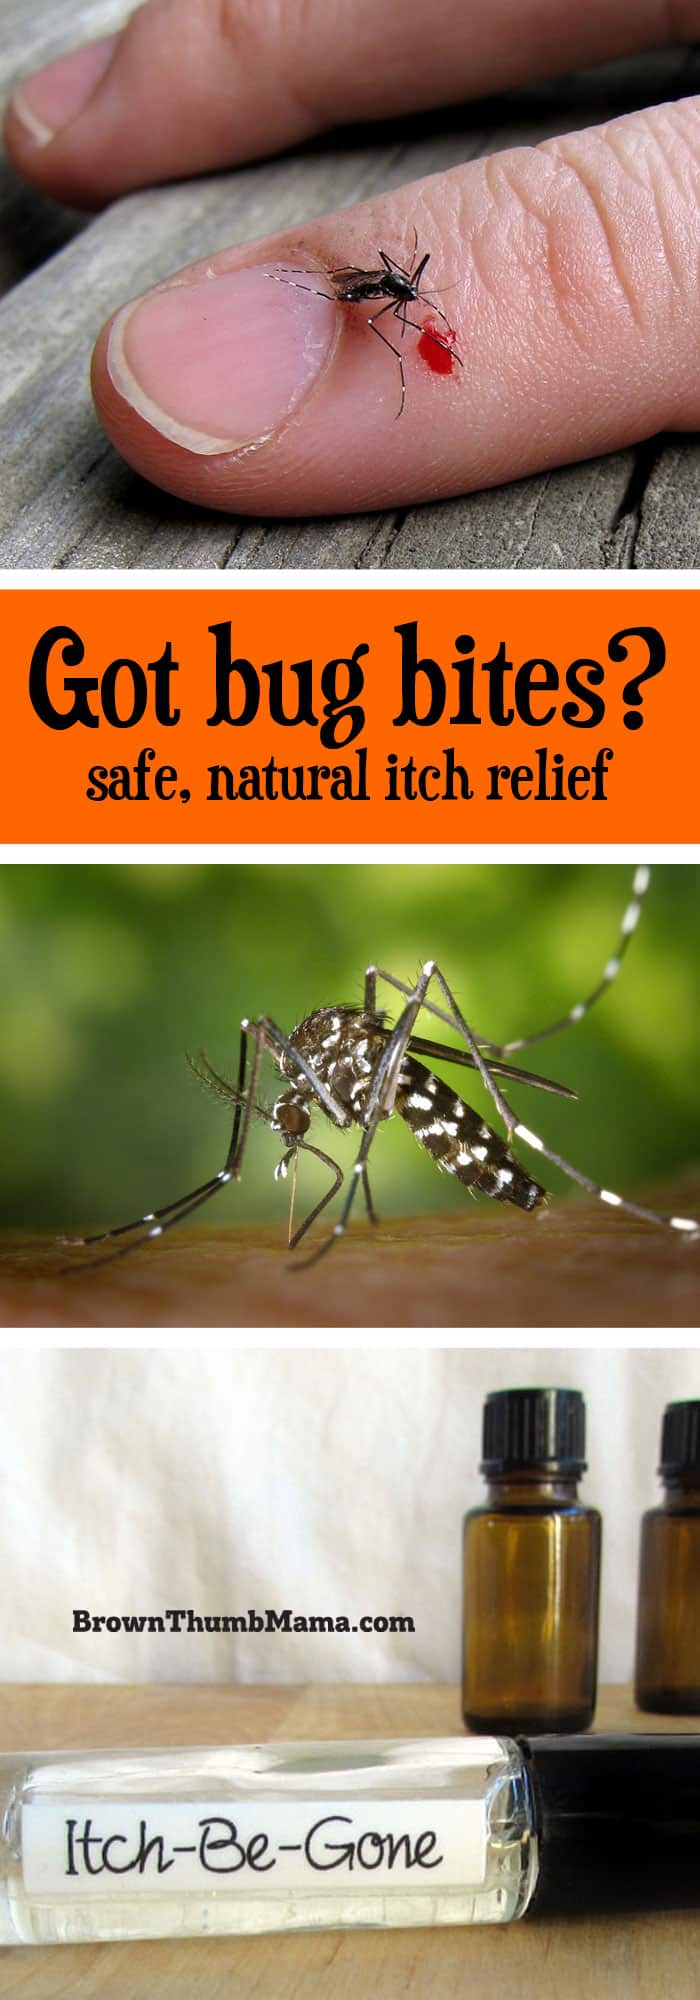 Natural Bug Bite Relief Brown Thumb Mama